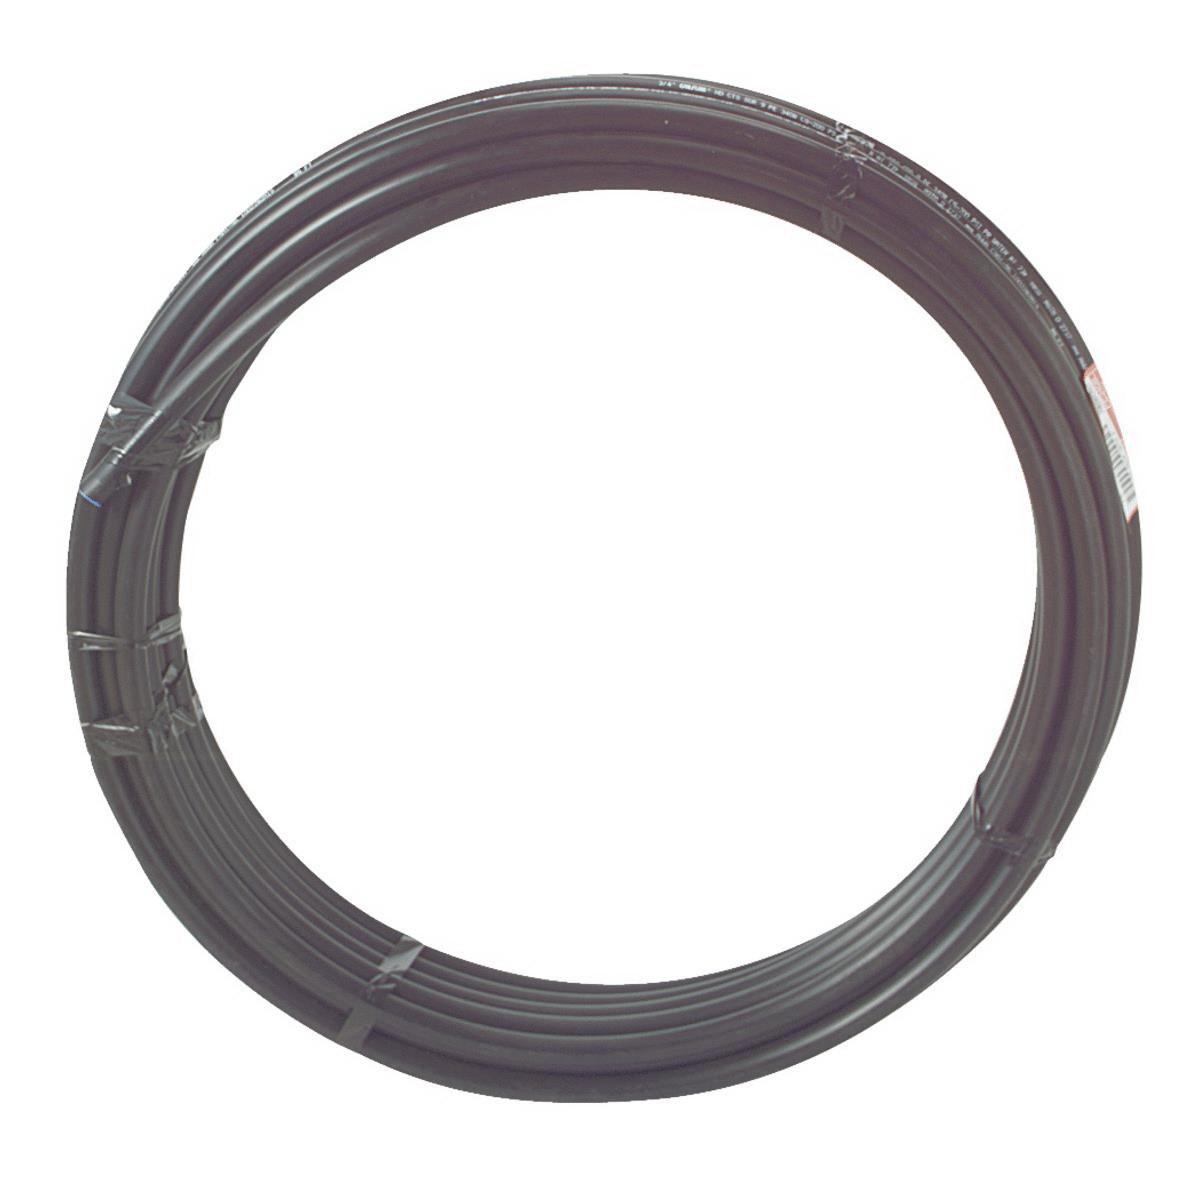 CRESLINE® 18540 Black Polyethylene Flexible Pipe, 1 in x 300 ft, CTS